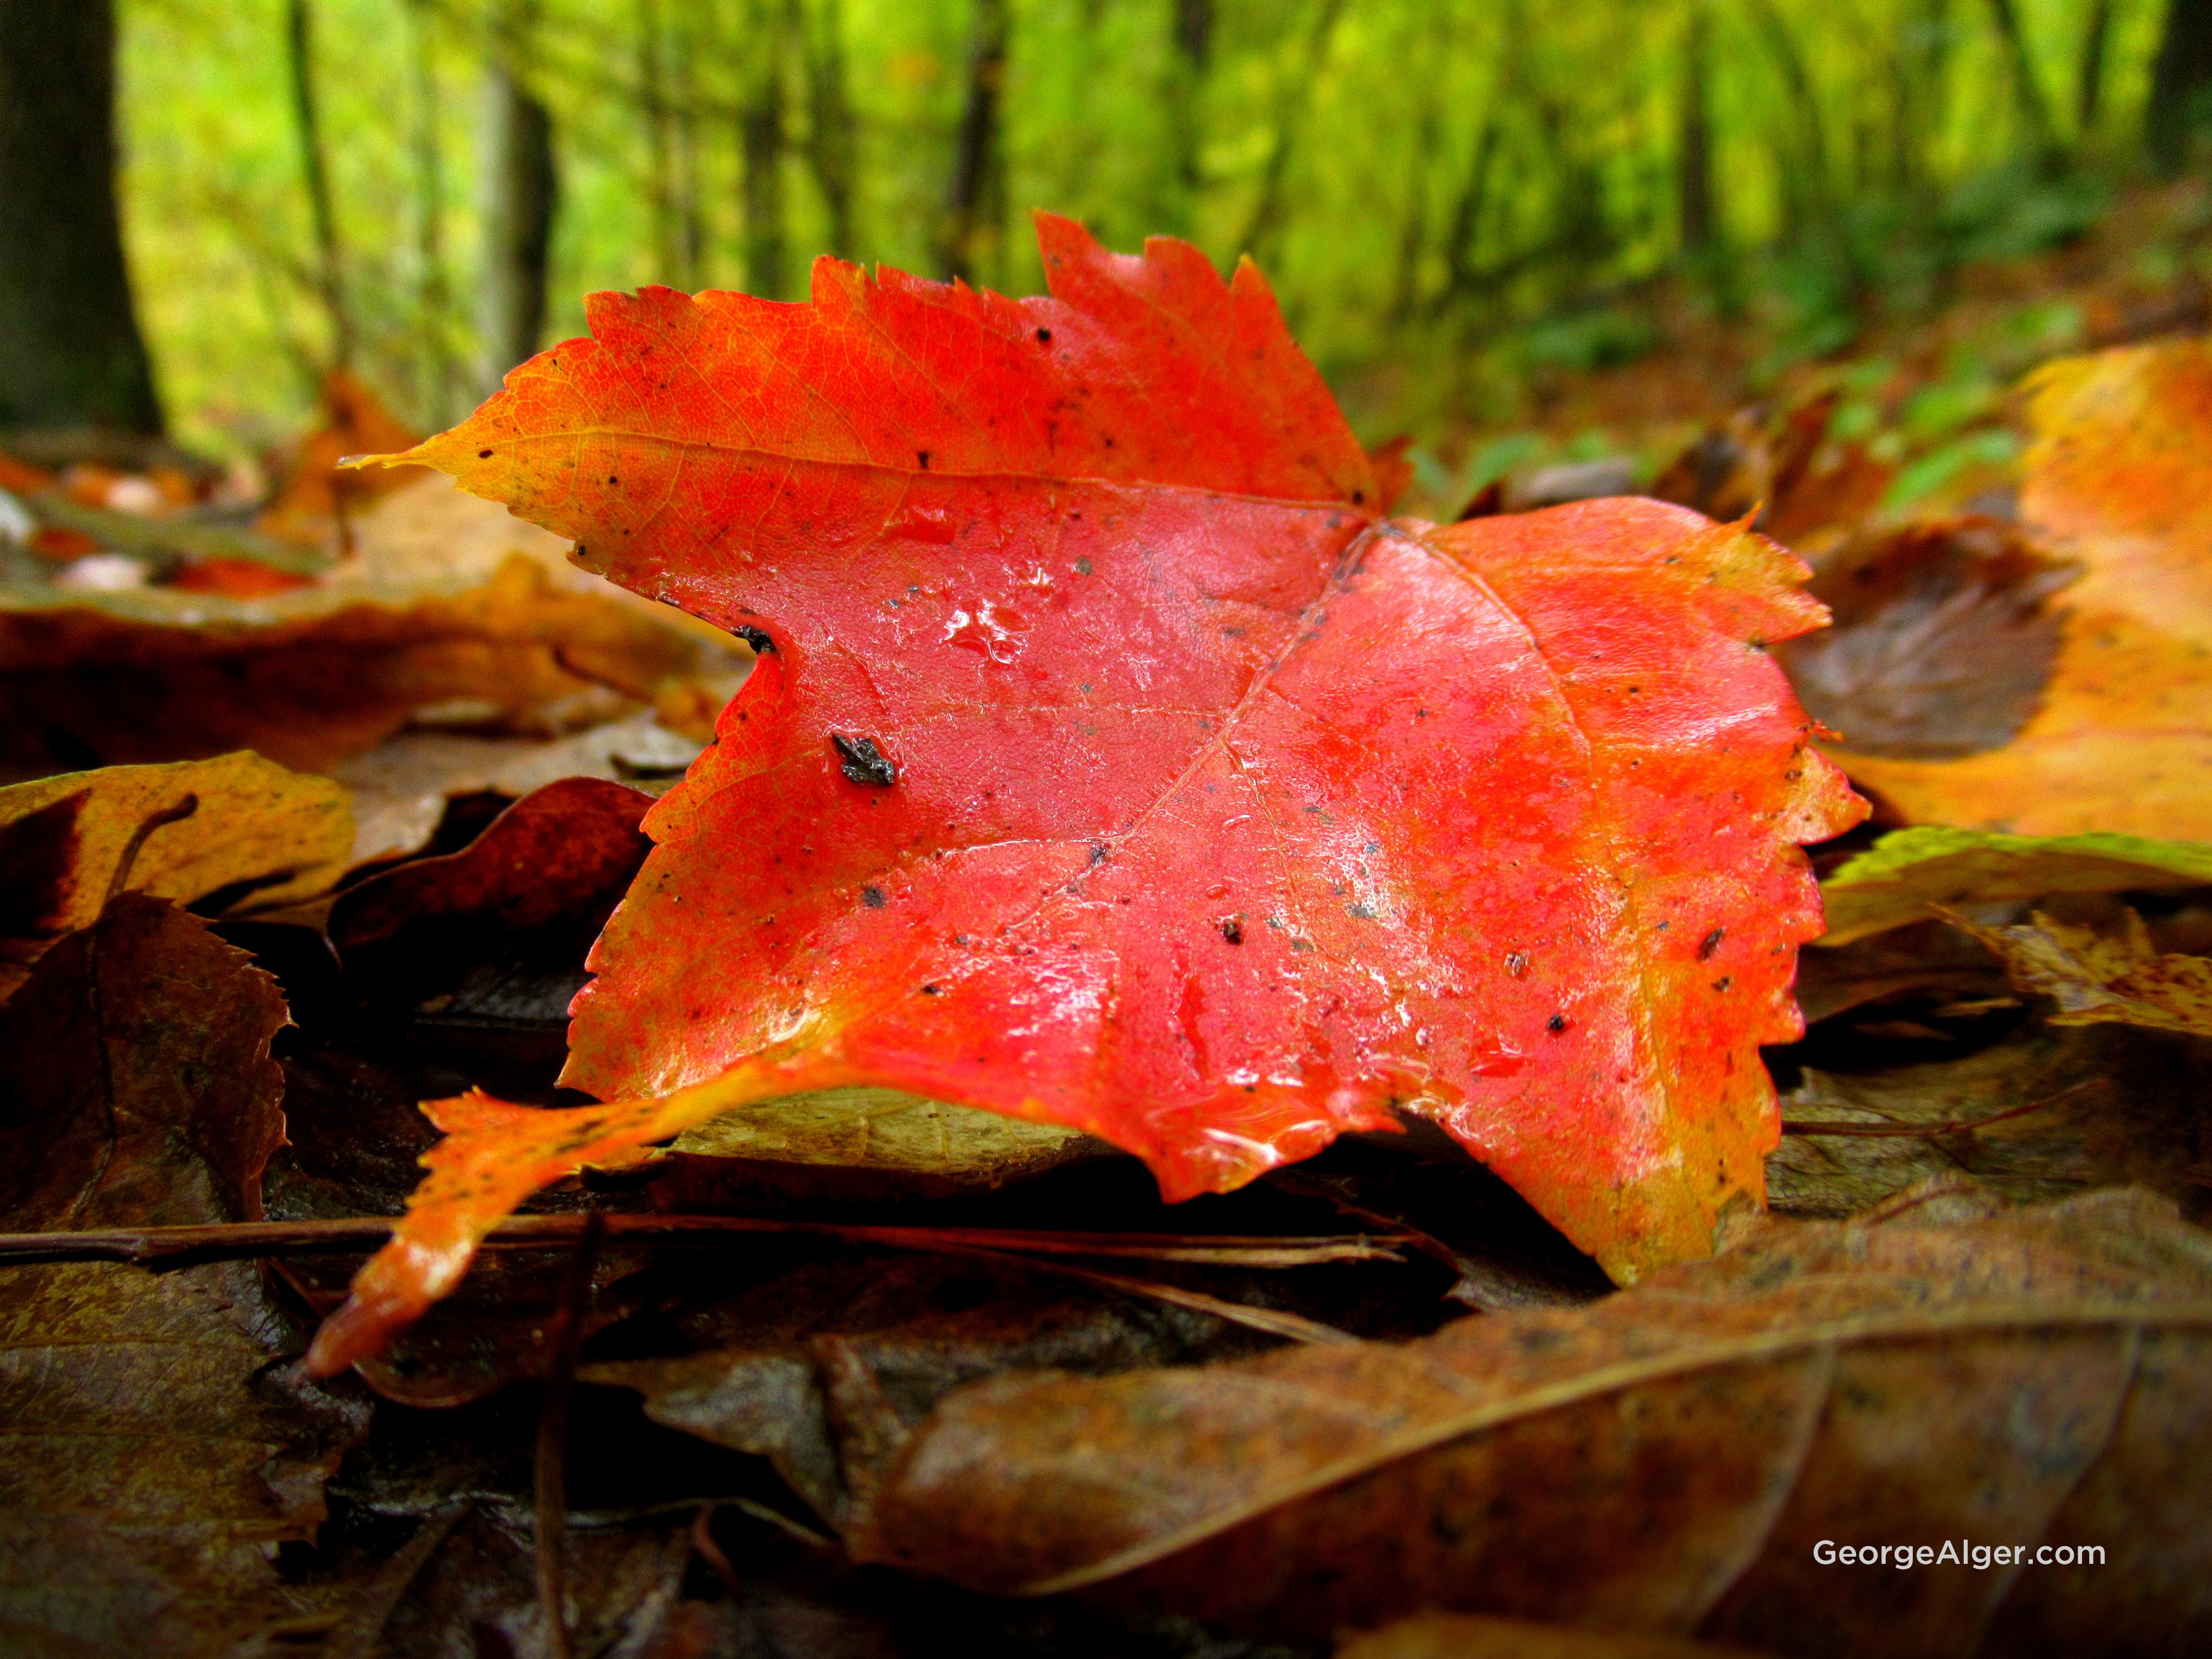 Freshly Fallen, by George Alger